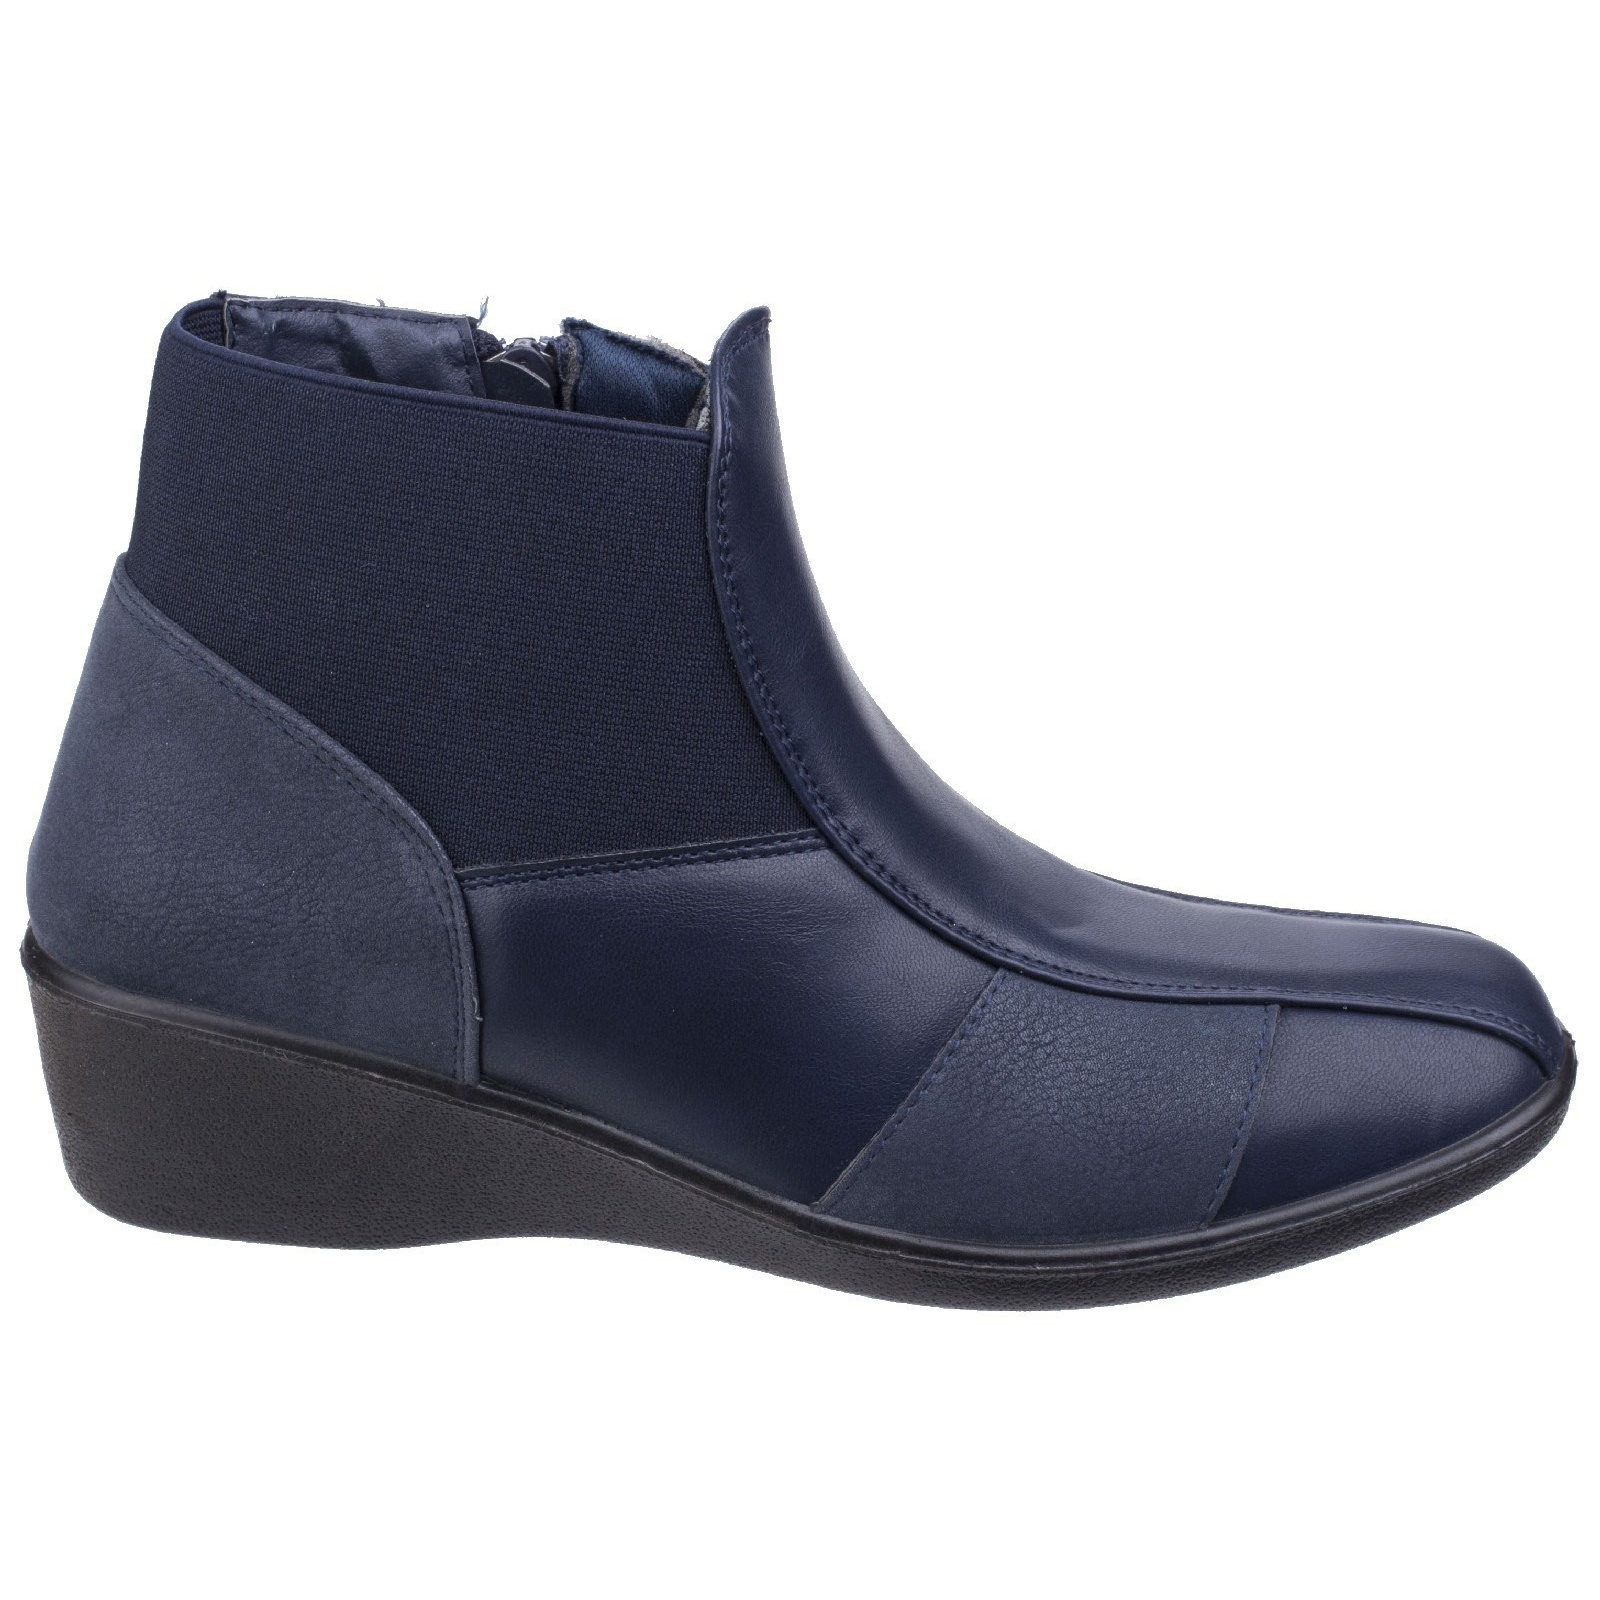 Cipriata Womens//Ladies Alesia Side Zip Ankle Boot DF1849